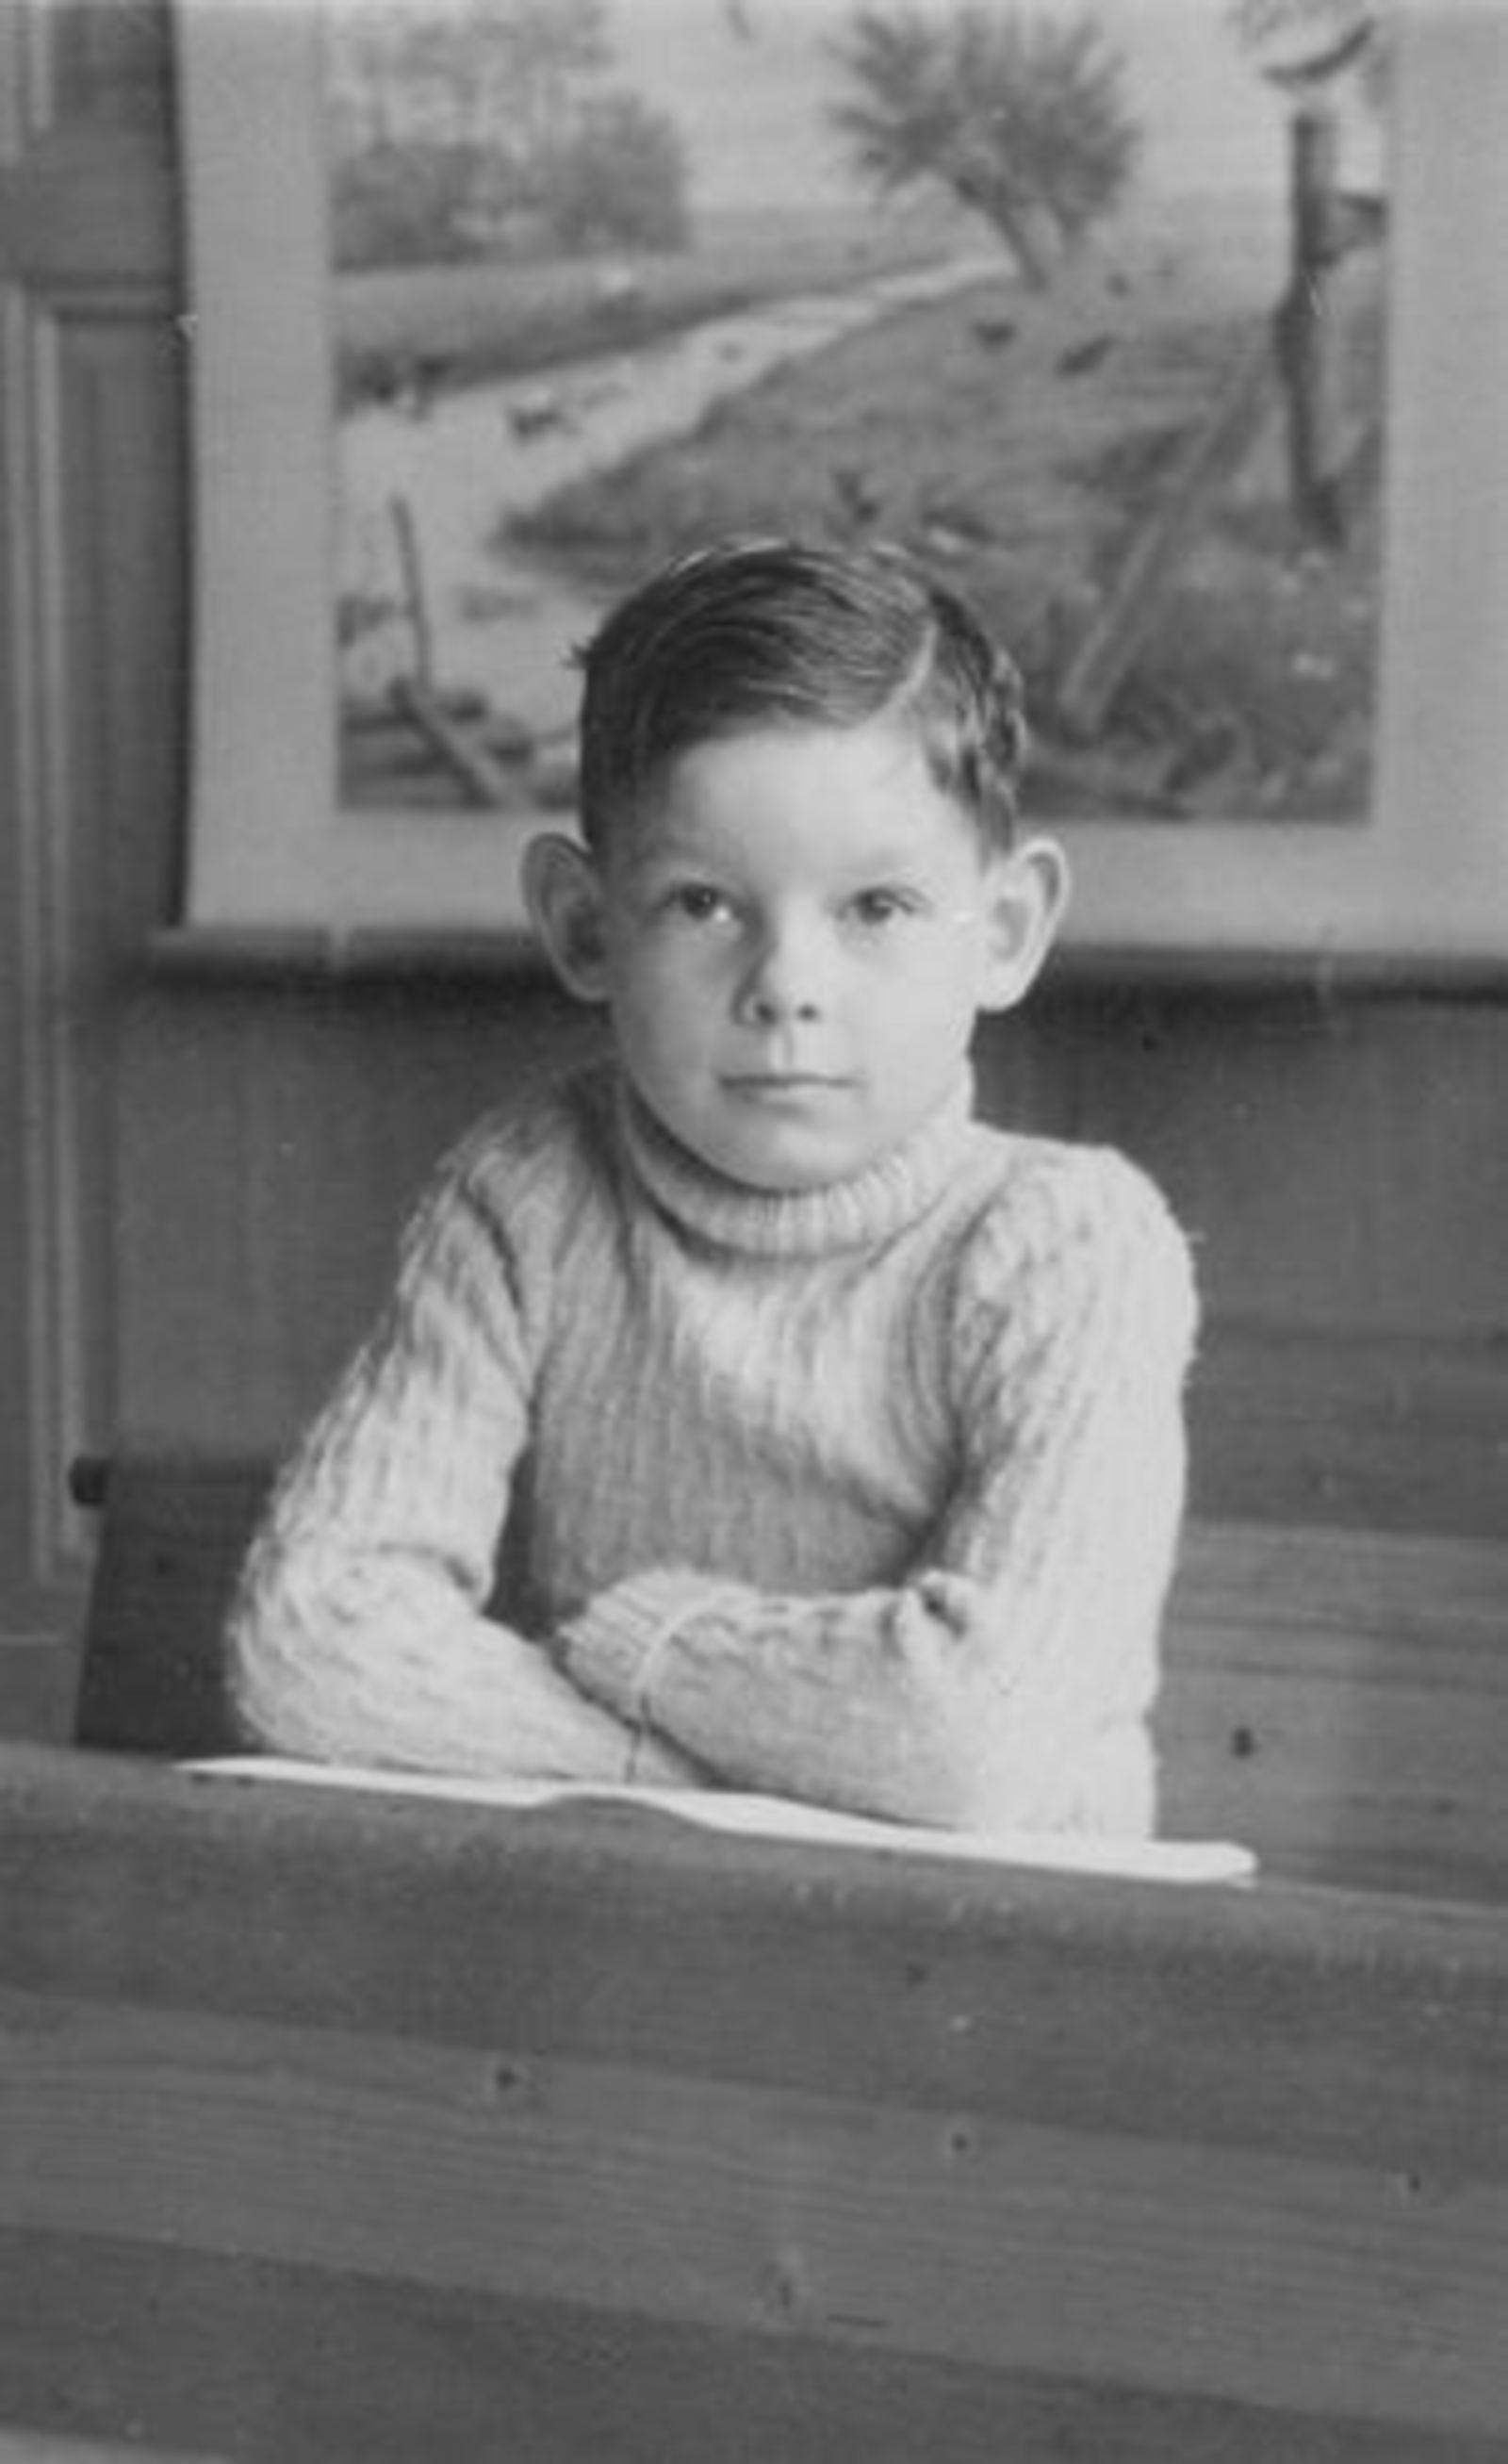 Koolbergen Aad 1941 1949± Schoolfoto